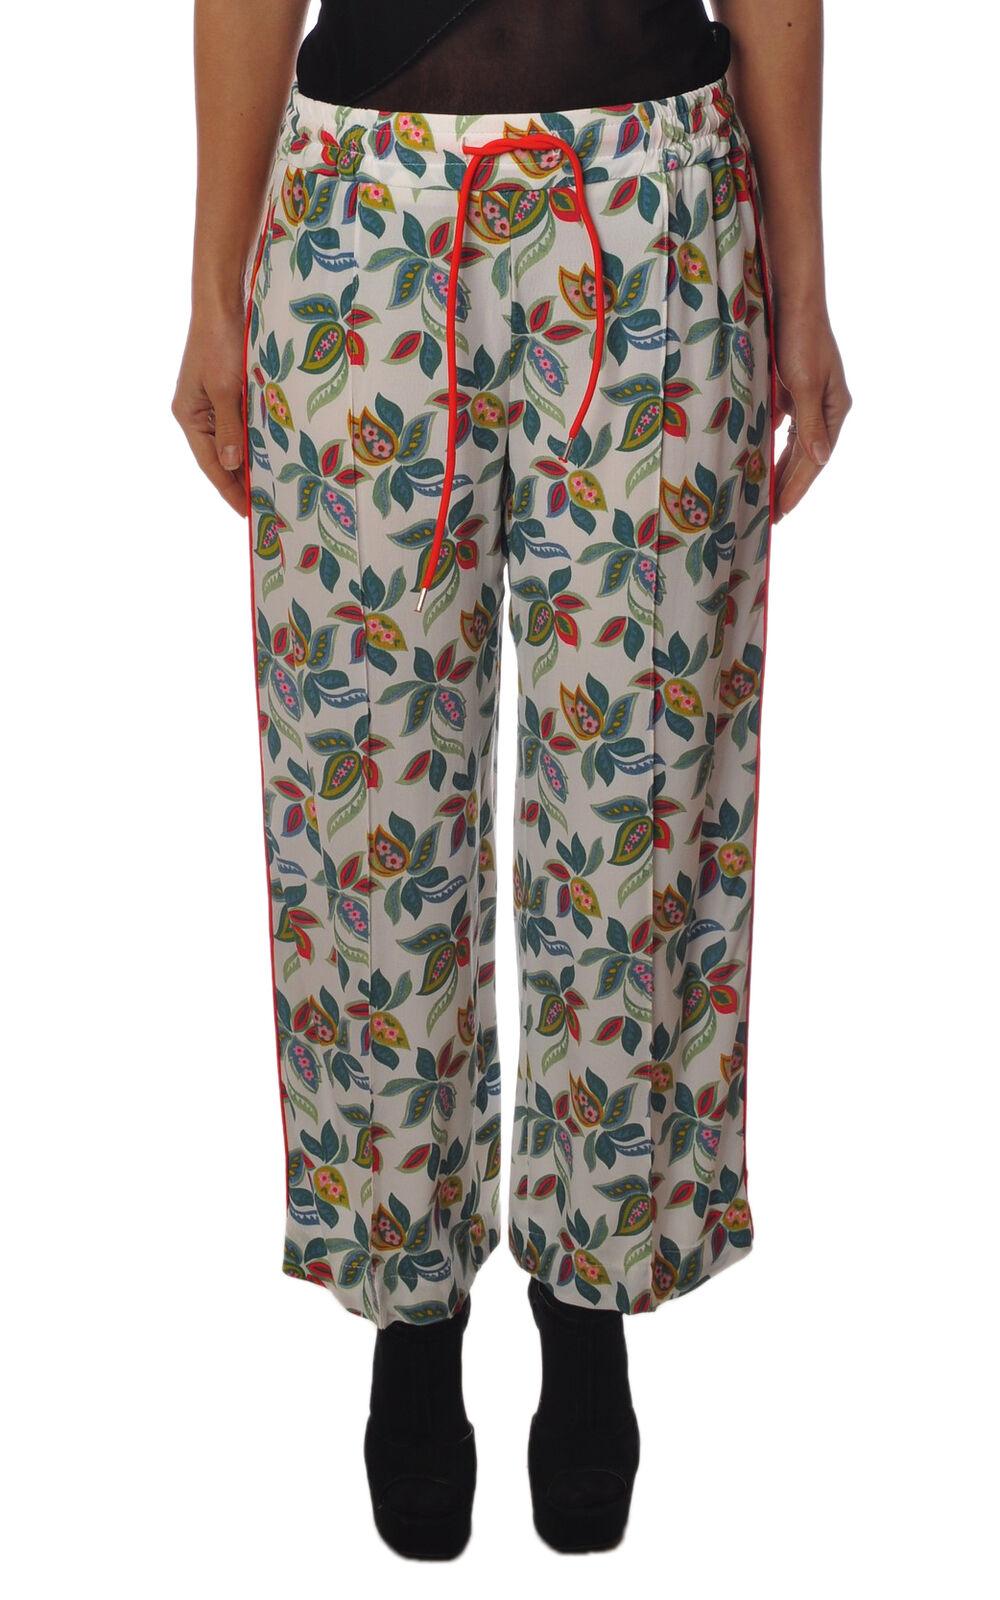 Ottod'ame - Pants-Pants - Woman - Fantasy - 4967931G181318